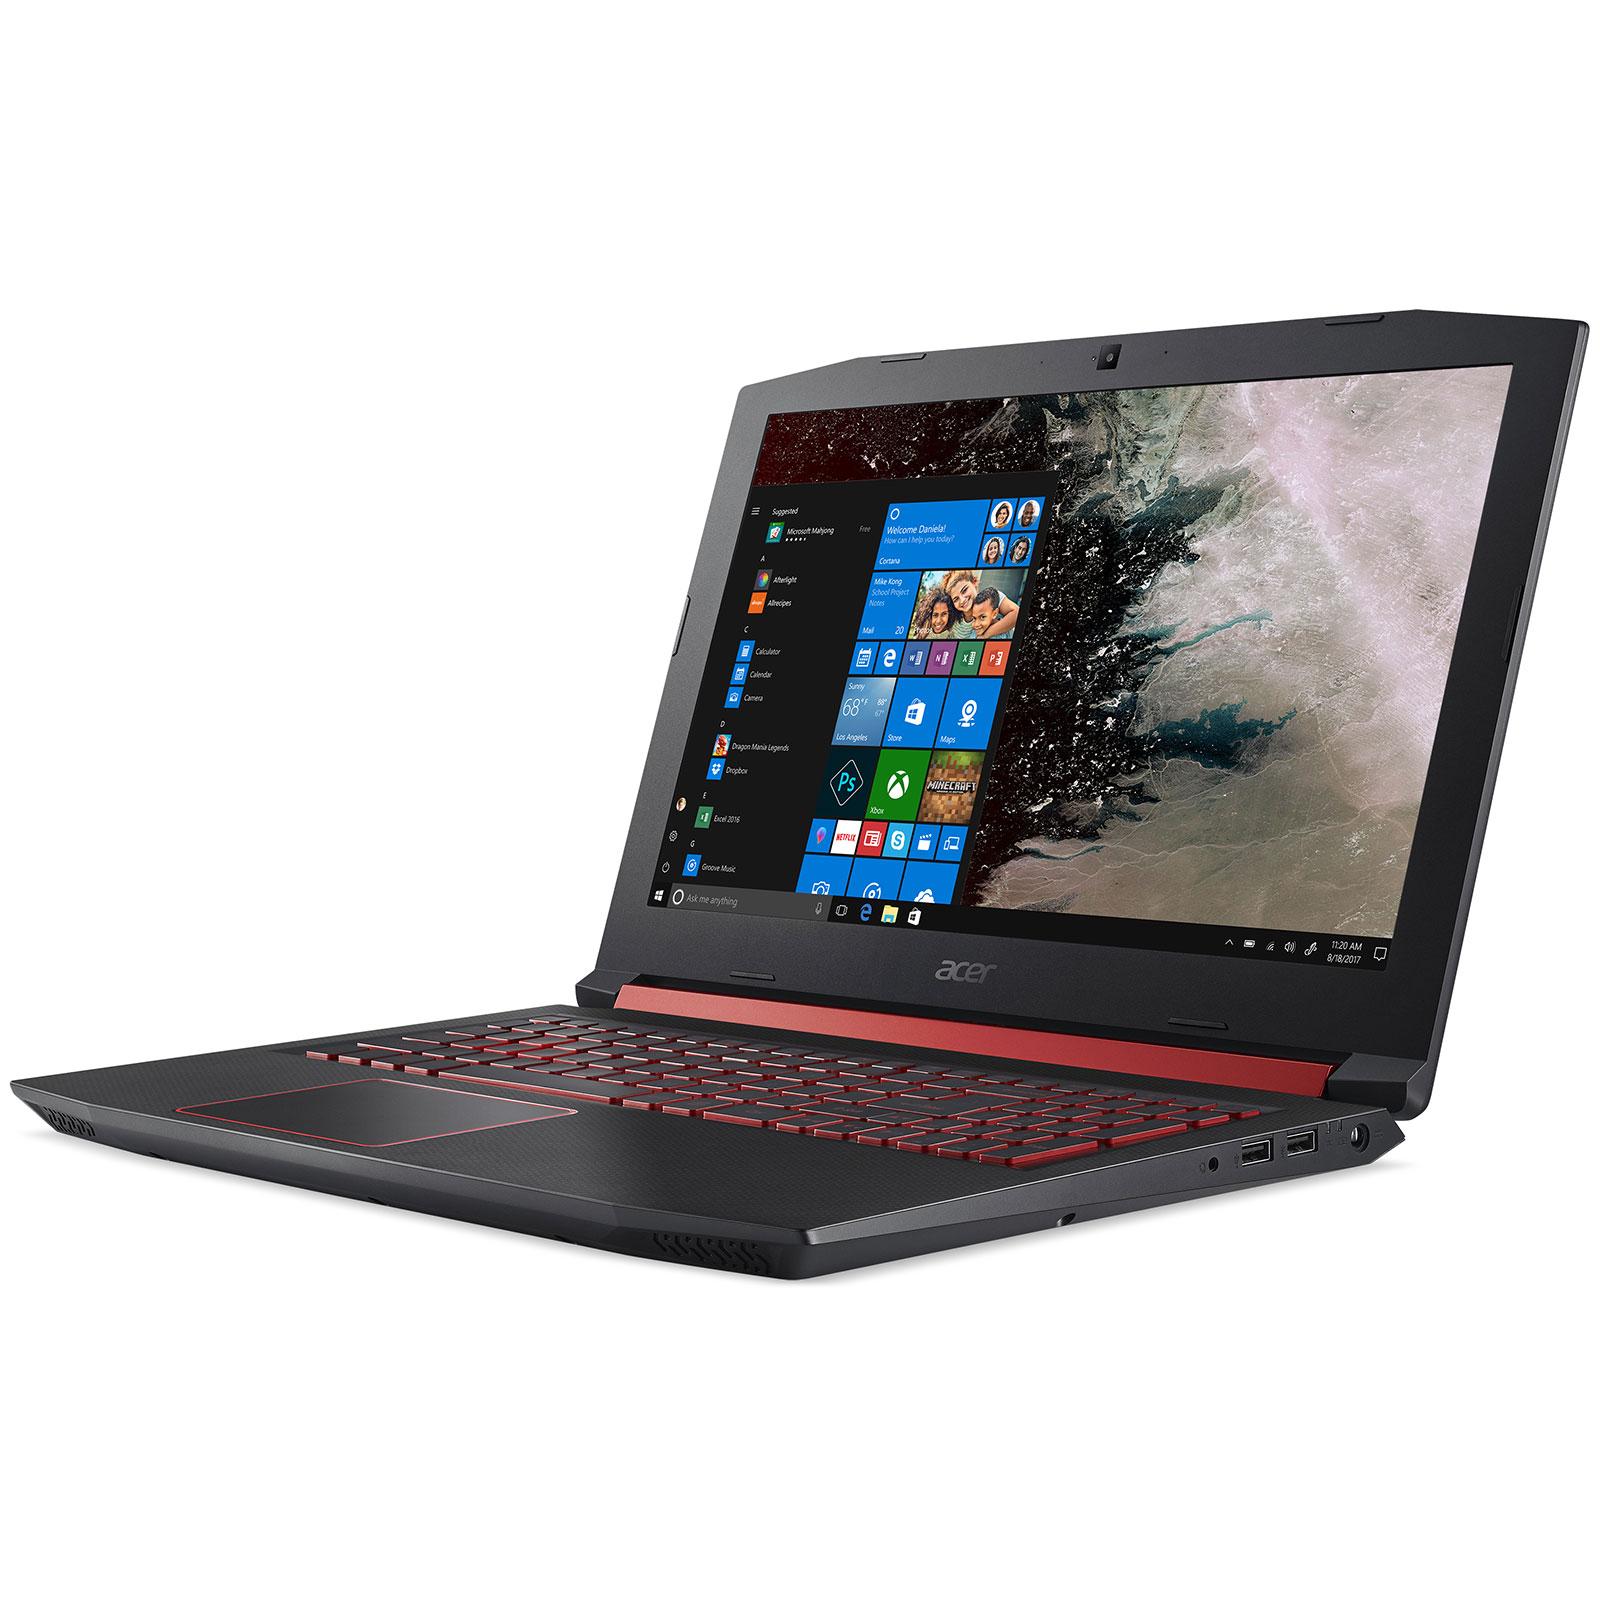 Acer NH.Q3MEF.002 - PC portable Acer - Cybertek.fr - 4